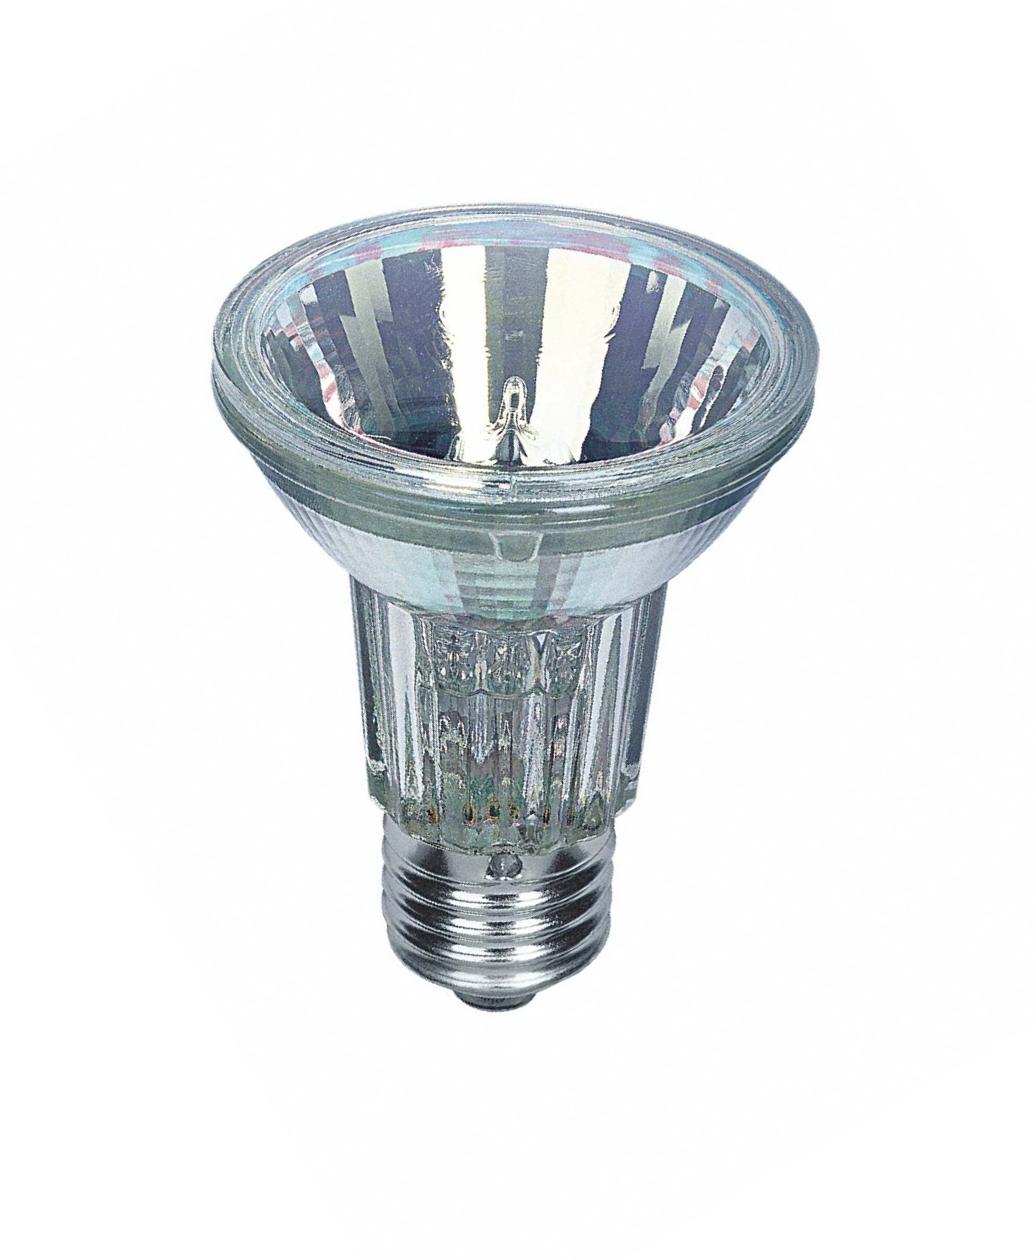 QPAR-CB 20 50W 30° E27, Halogenpressglaslampe